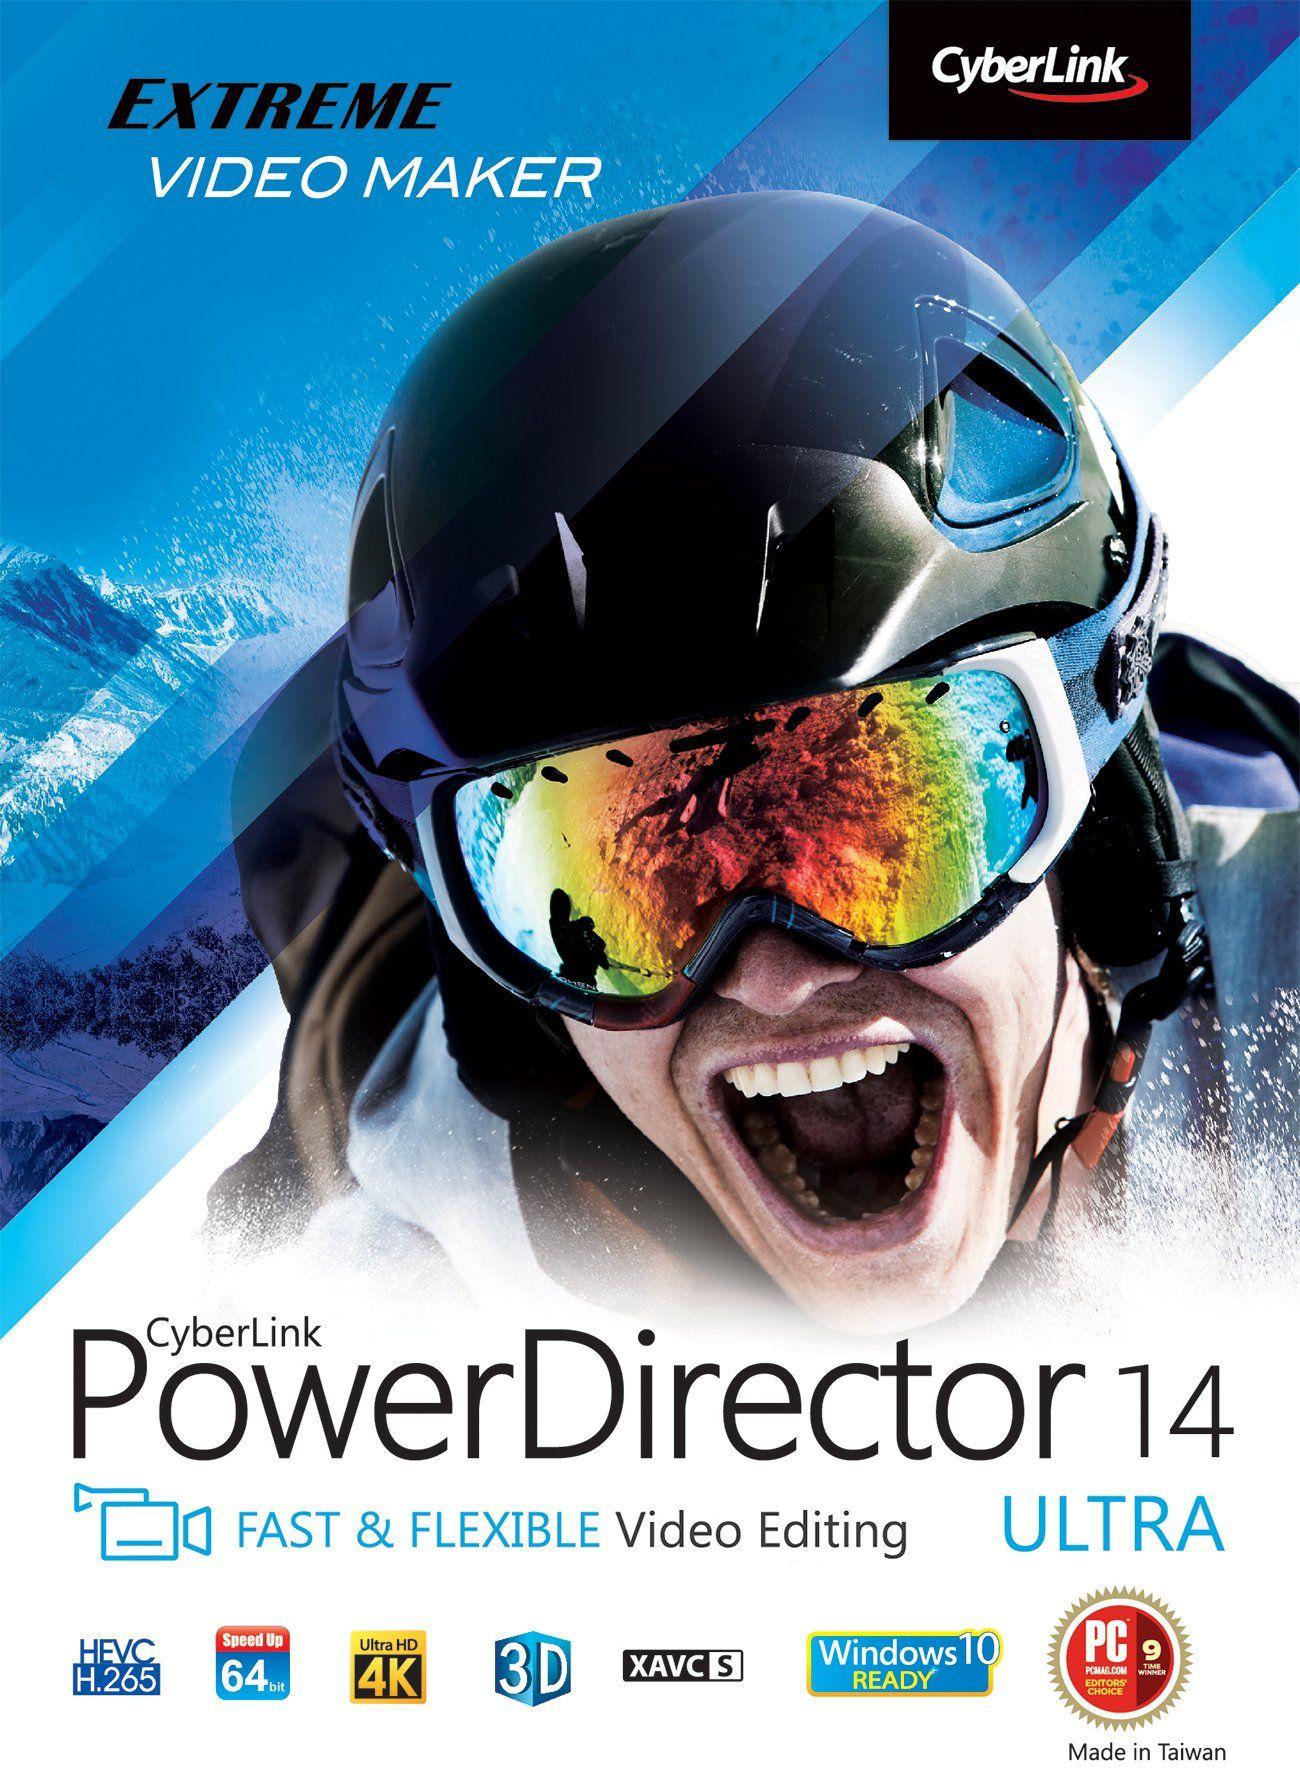 Cyberlink PowerDirector 14 Ultra (PC) Video editing